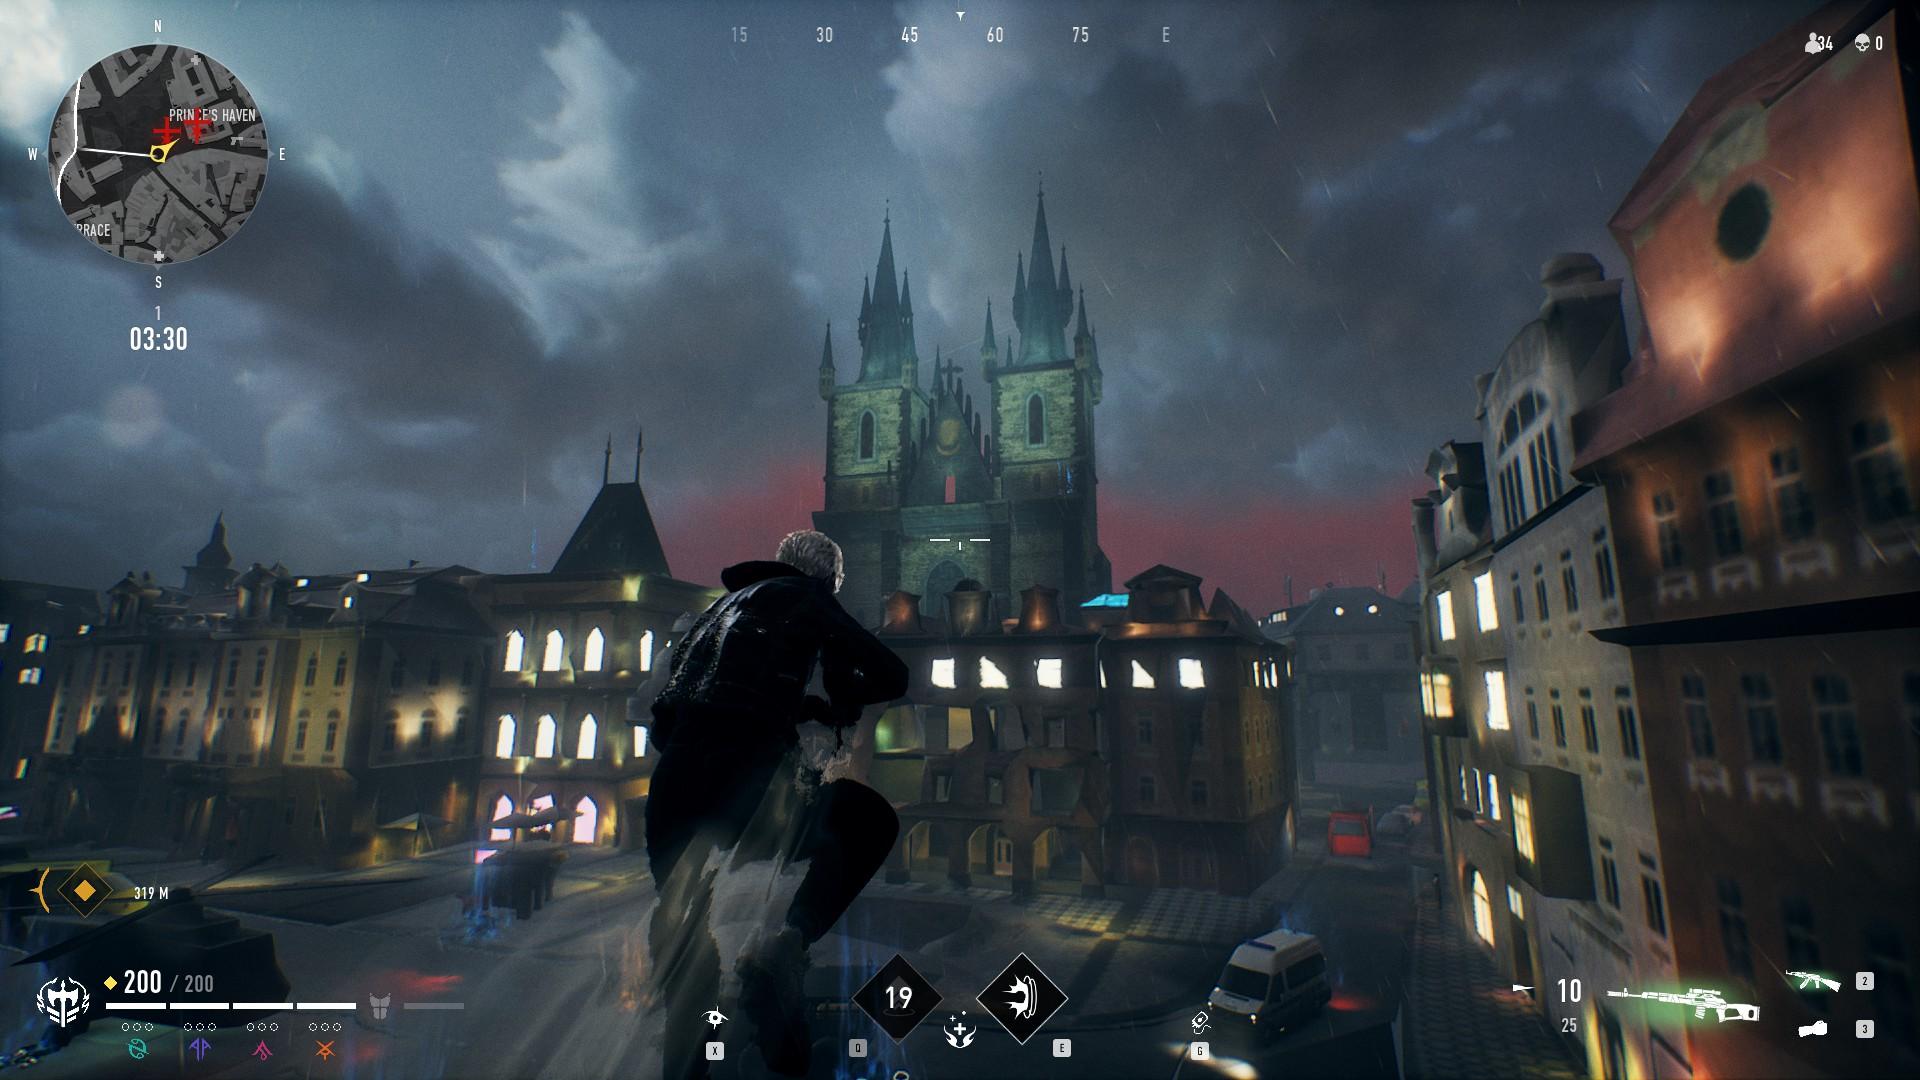 Bloodhunt - Clan Fertigkeit Brujah: Soaring Leap